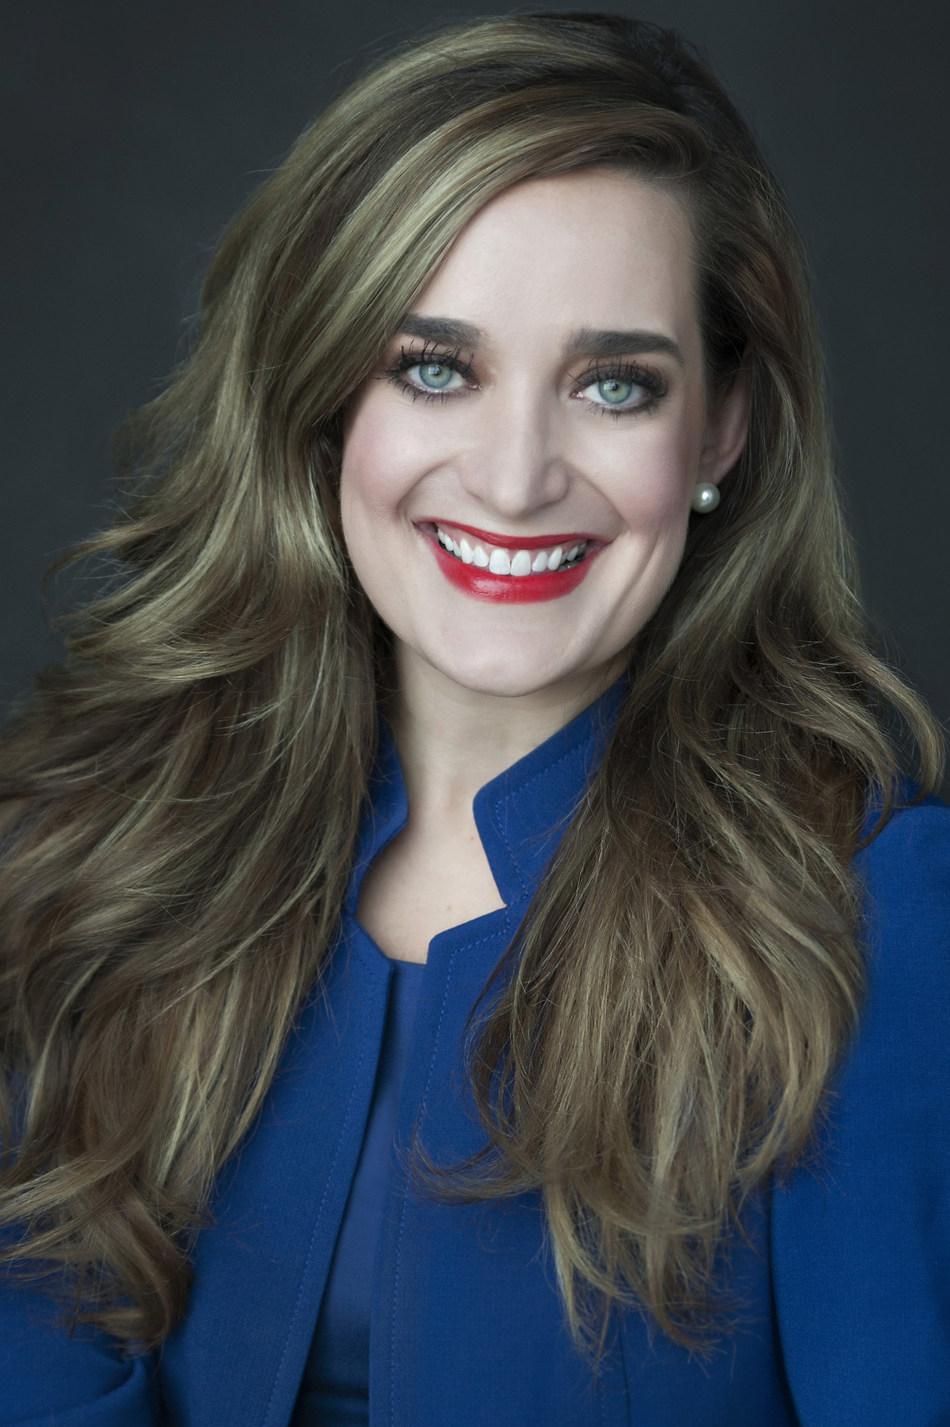 Lauren Burt, Head of Worldwide Communications at Kemin Industries